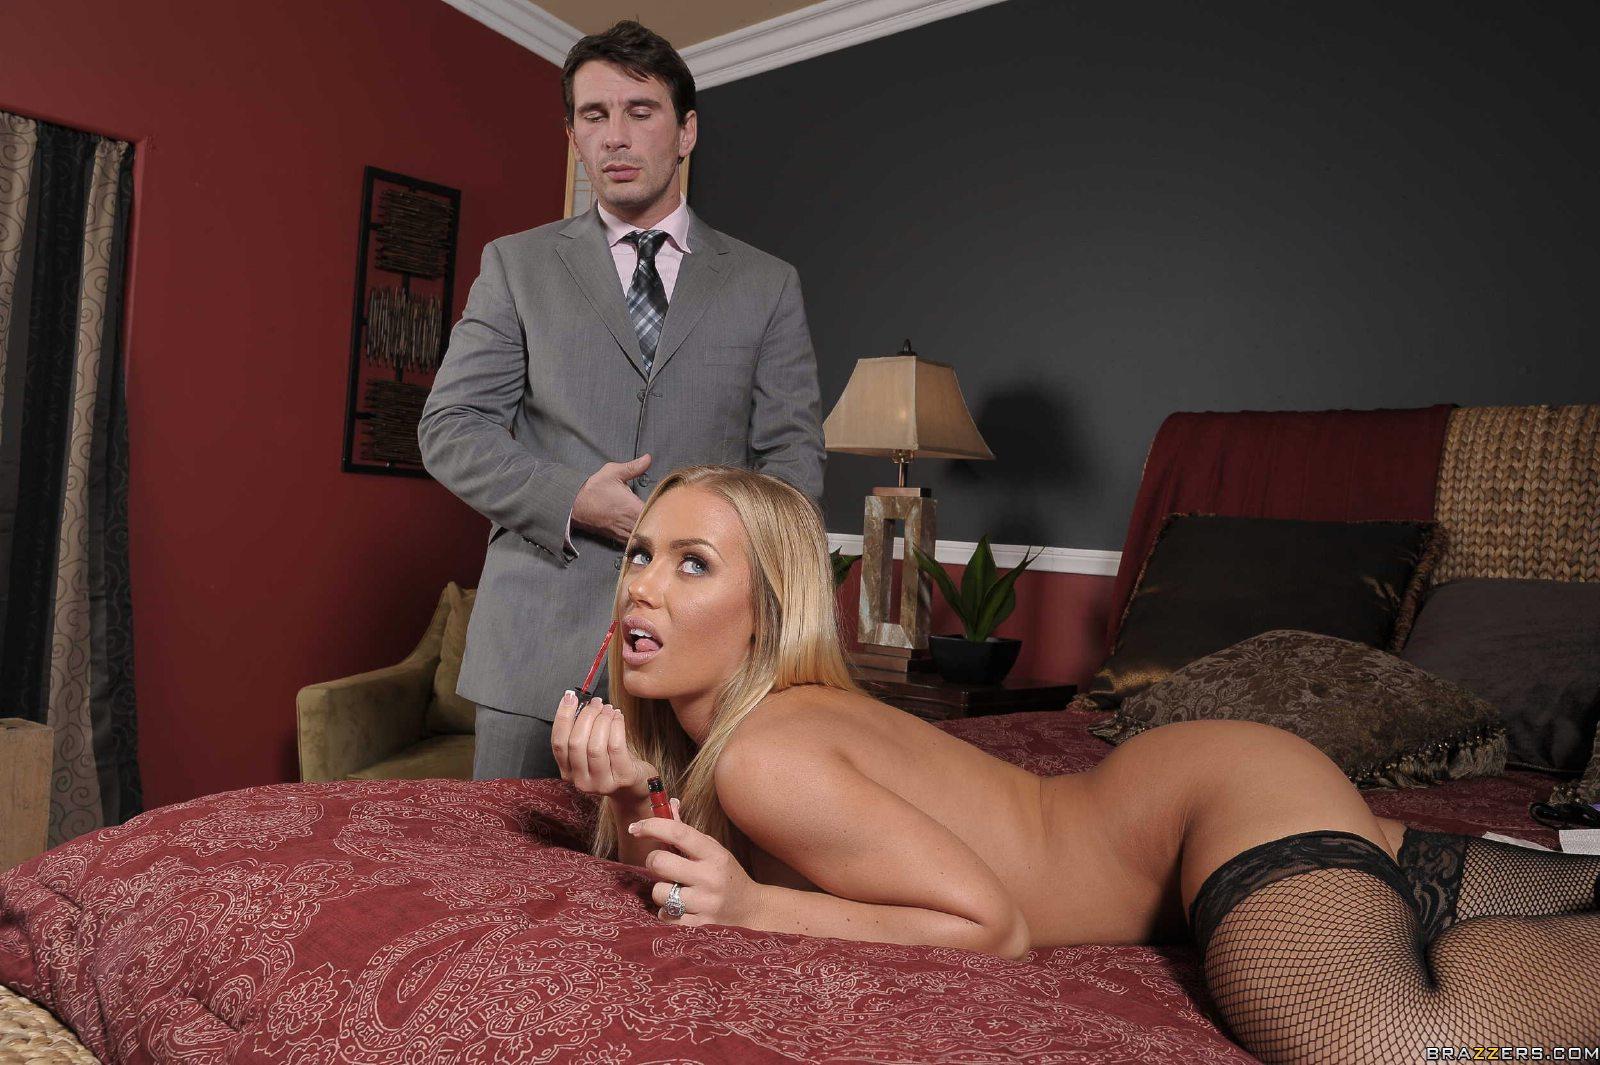 Фото муж изменяет жене фото секса 6 фотография